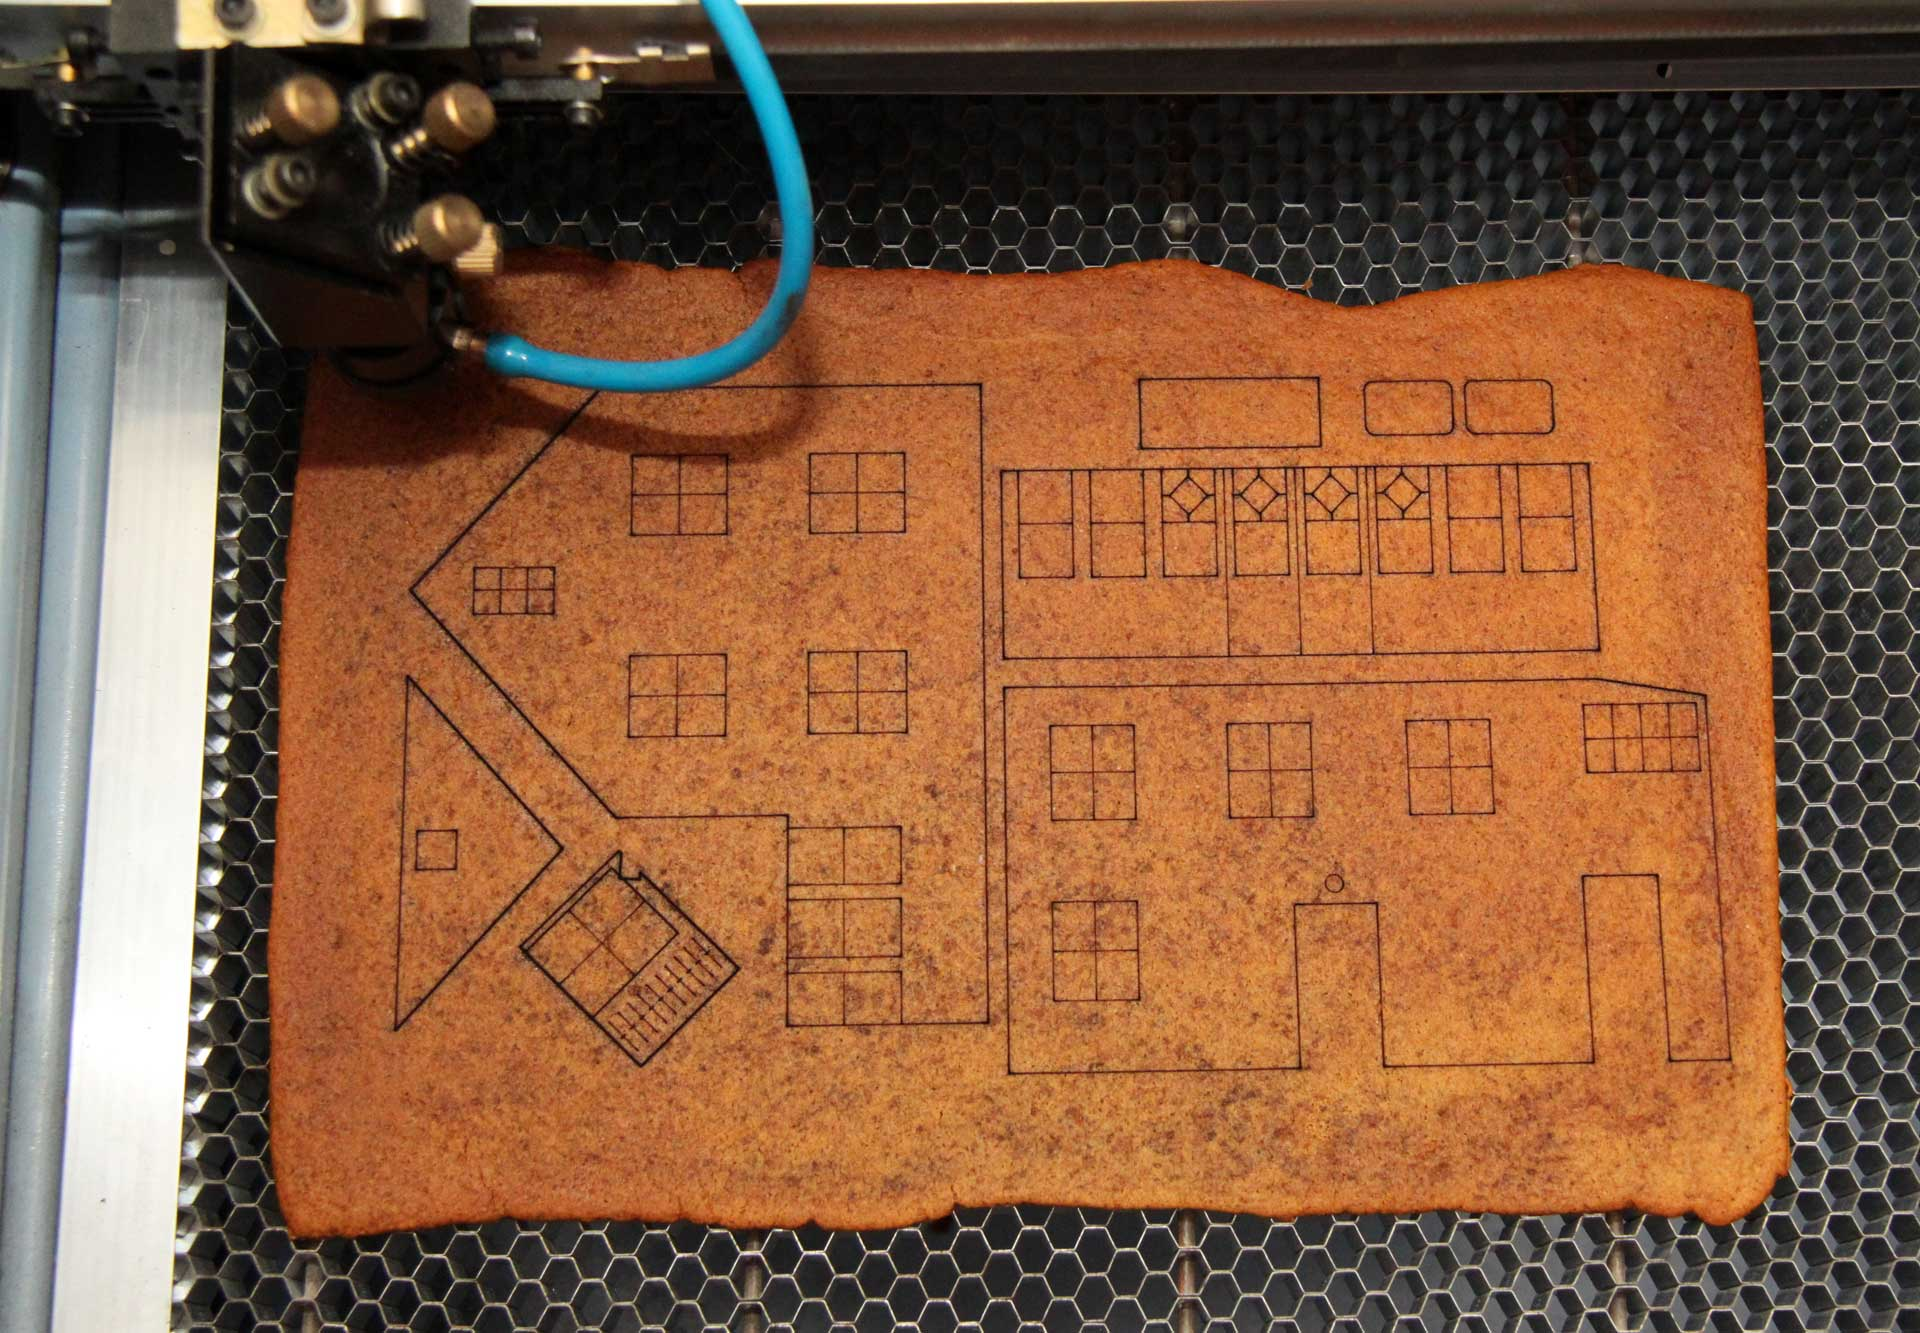 Laser Cut Gingerbread House Johan Von Konow